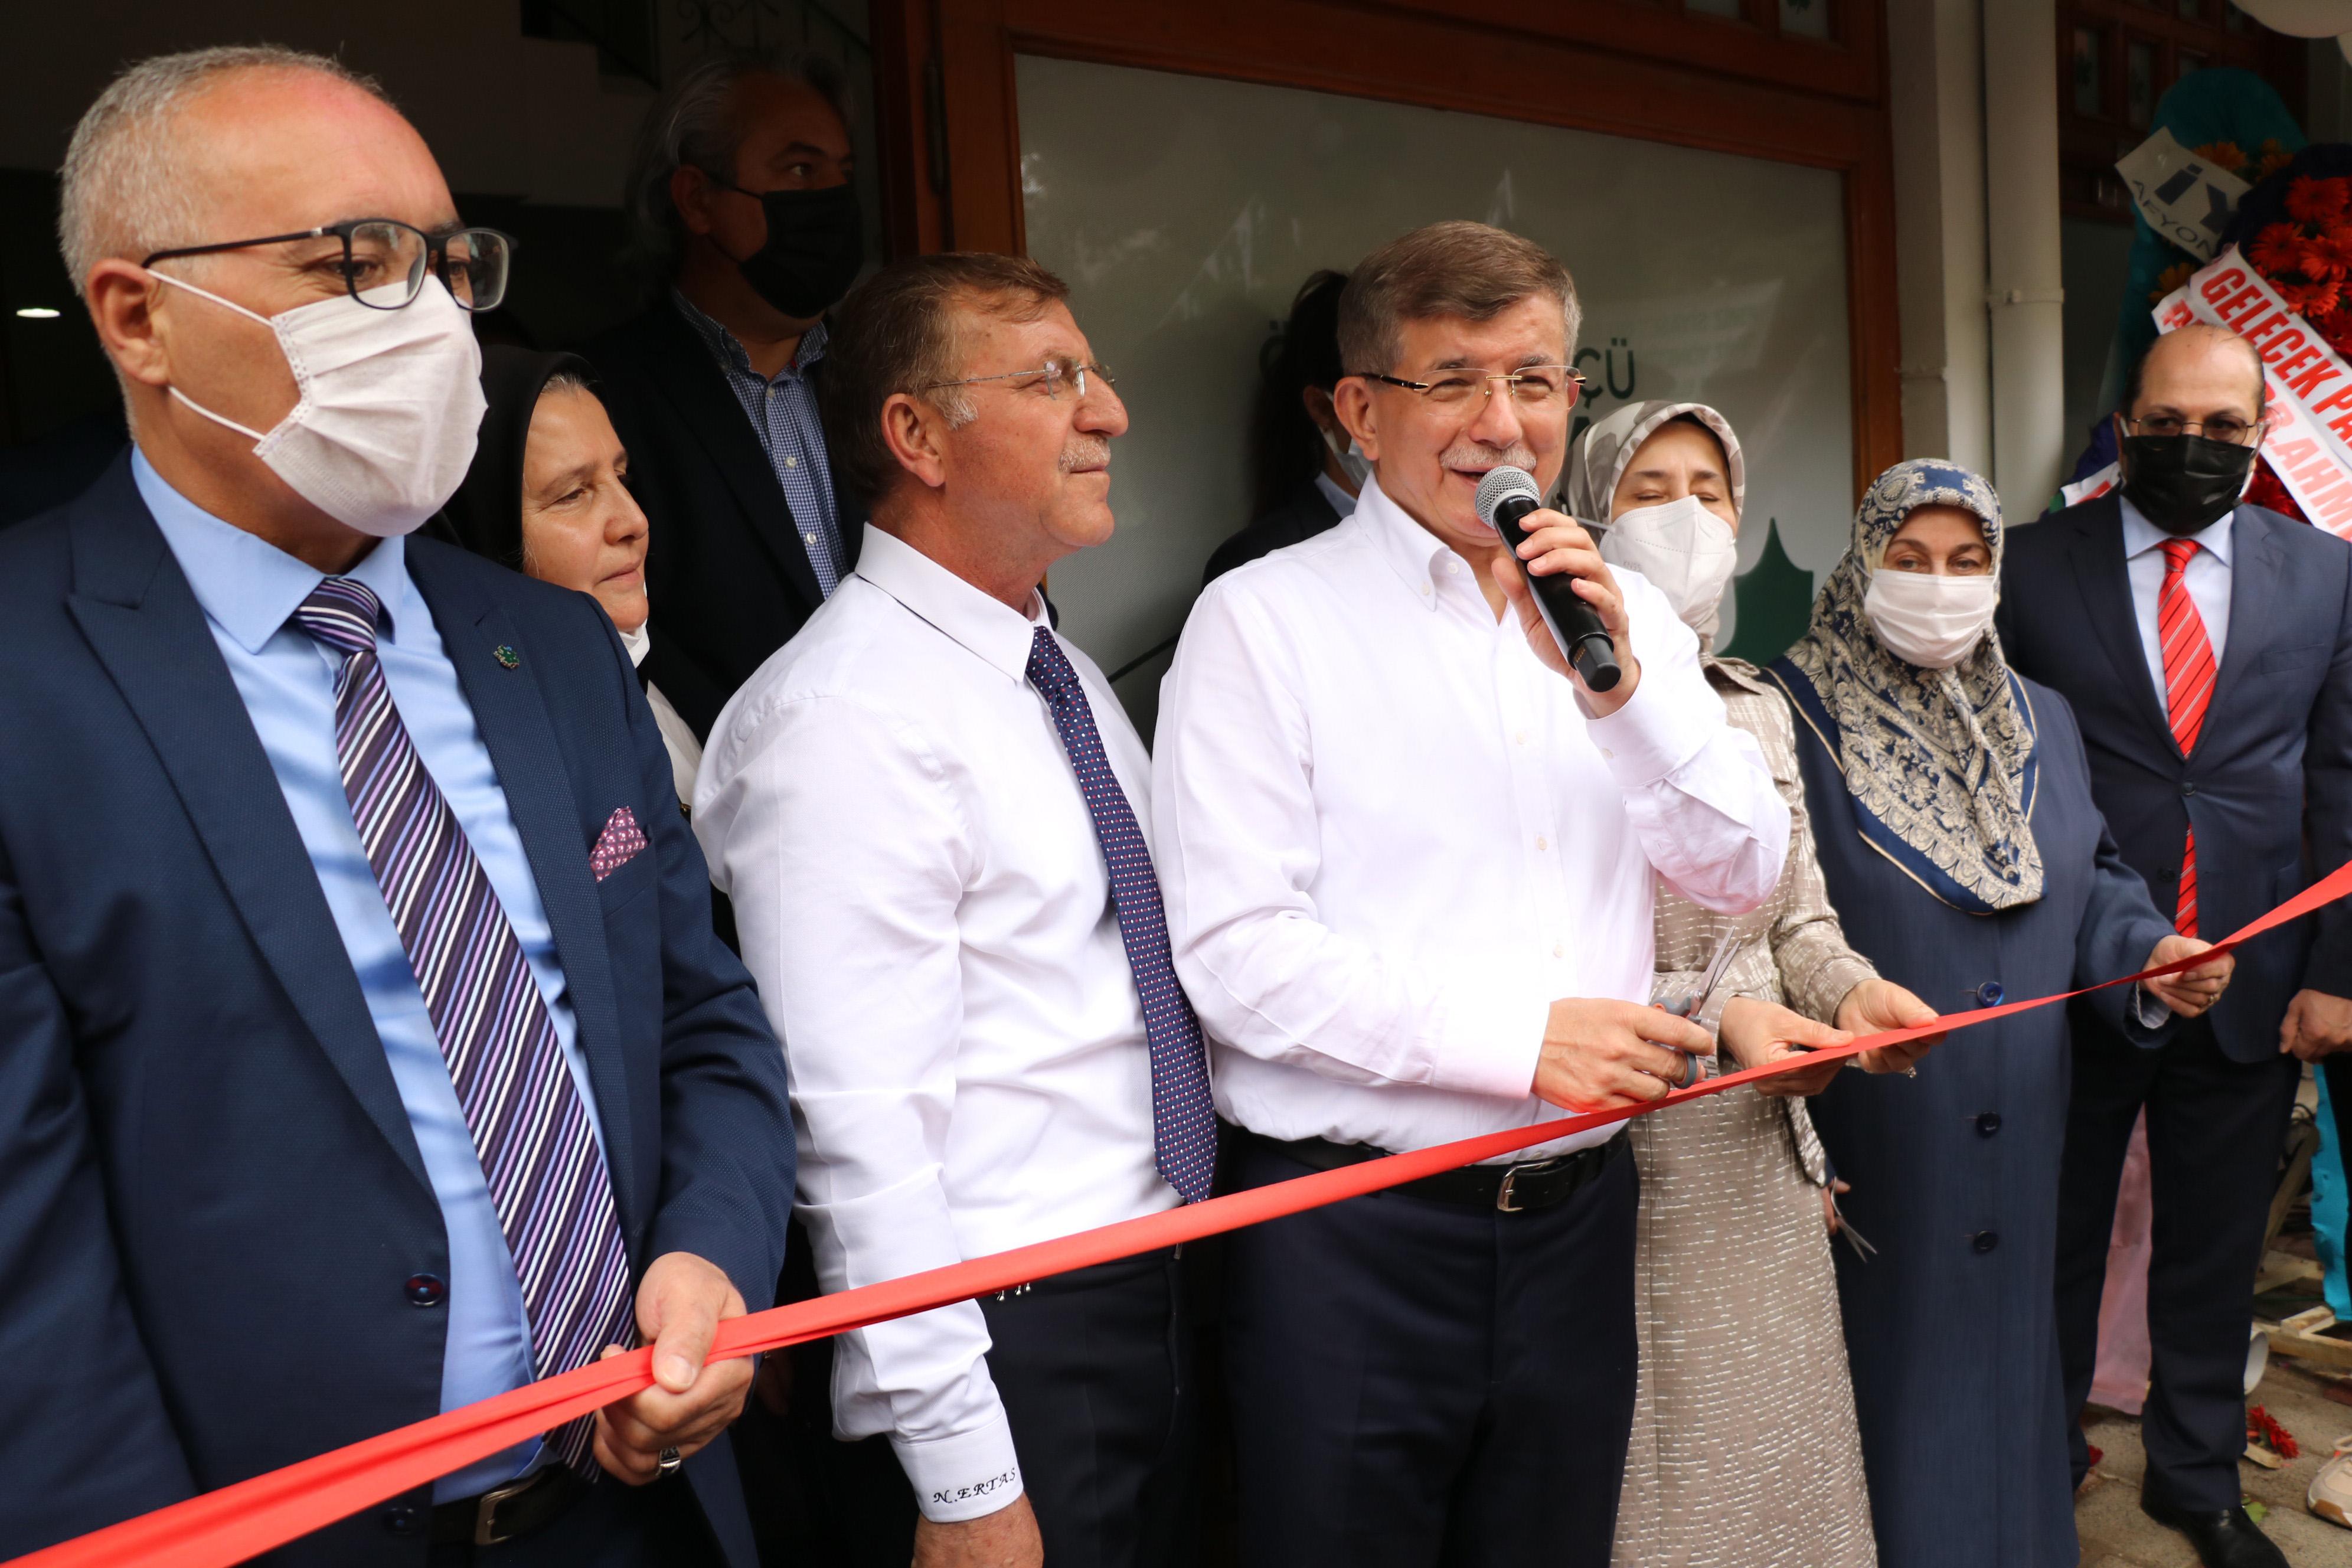 1622559573018 davutoglu turkiyede temiz siyaset ihtiyaci var 6808 dhaphoto 1